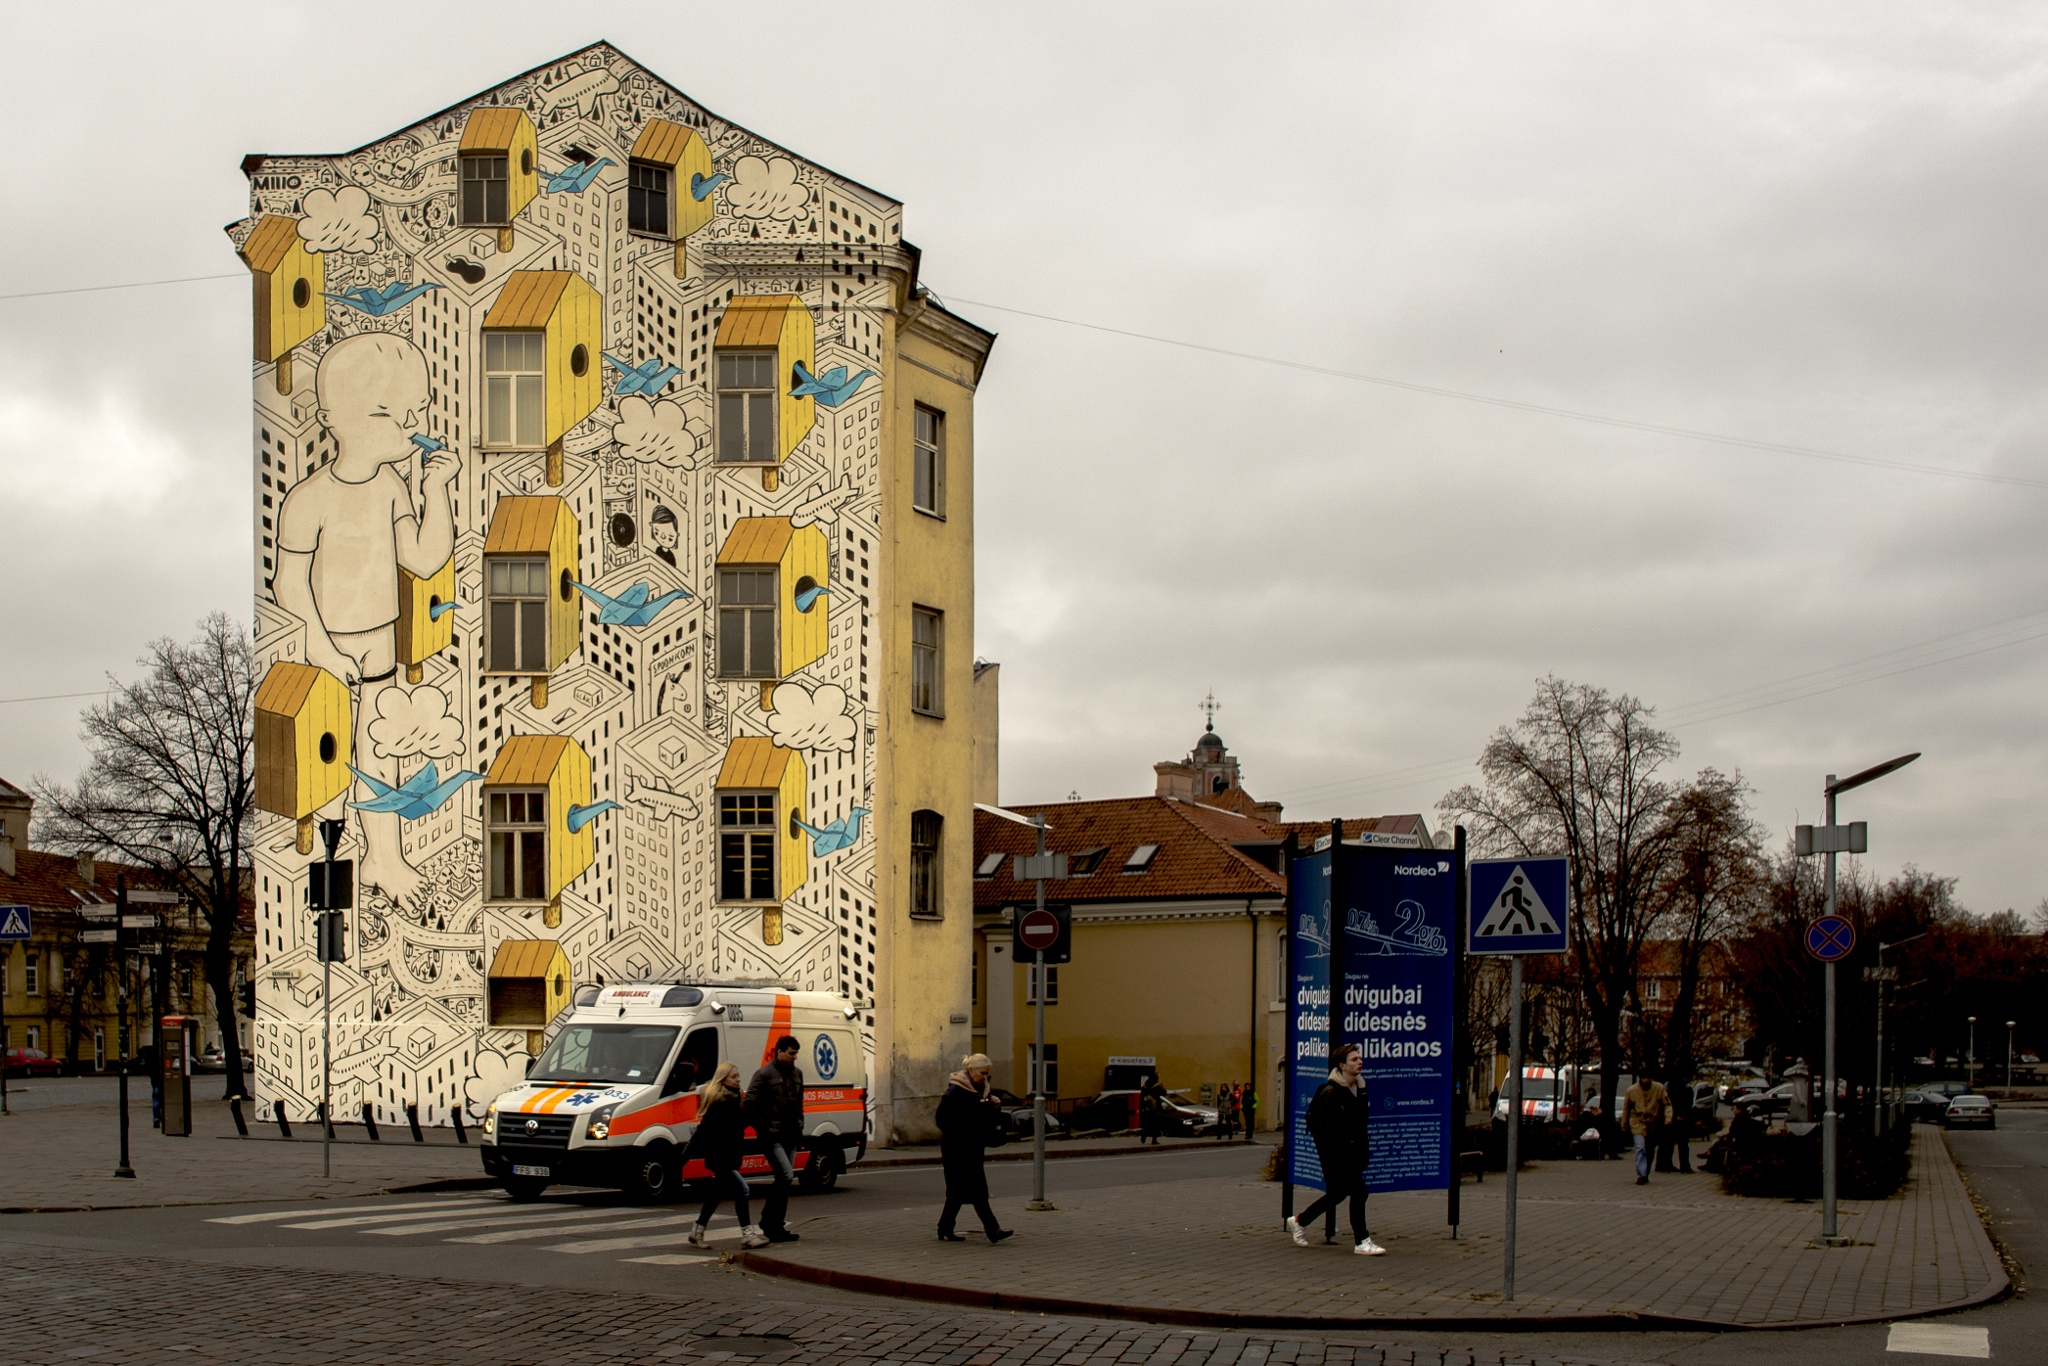 City Art by Ole Morten Eyra